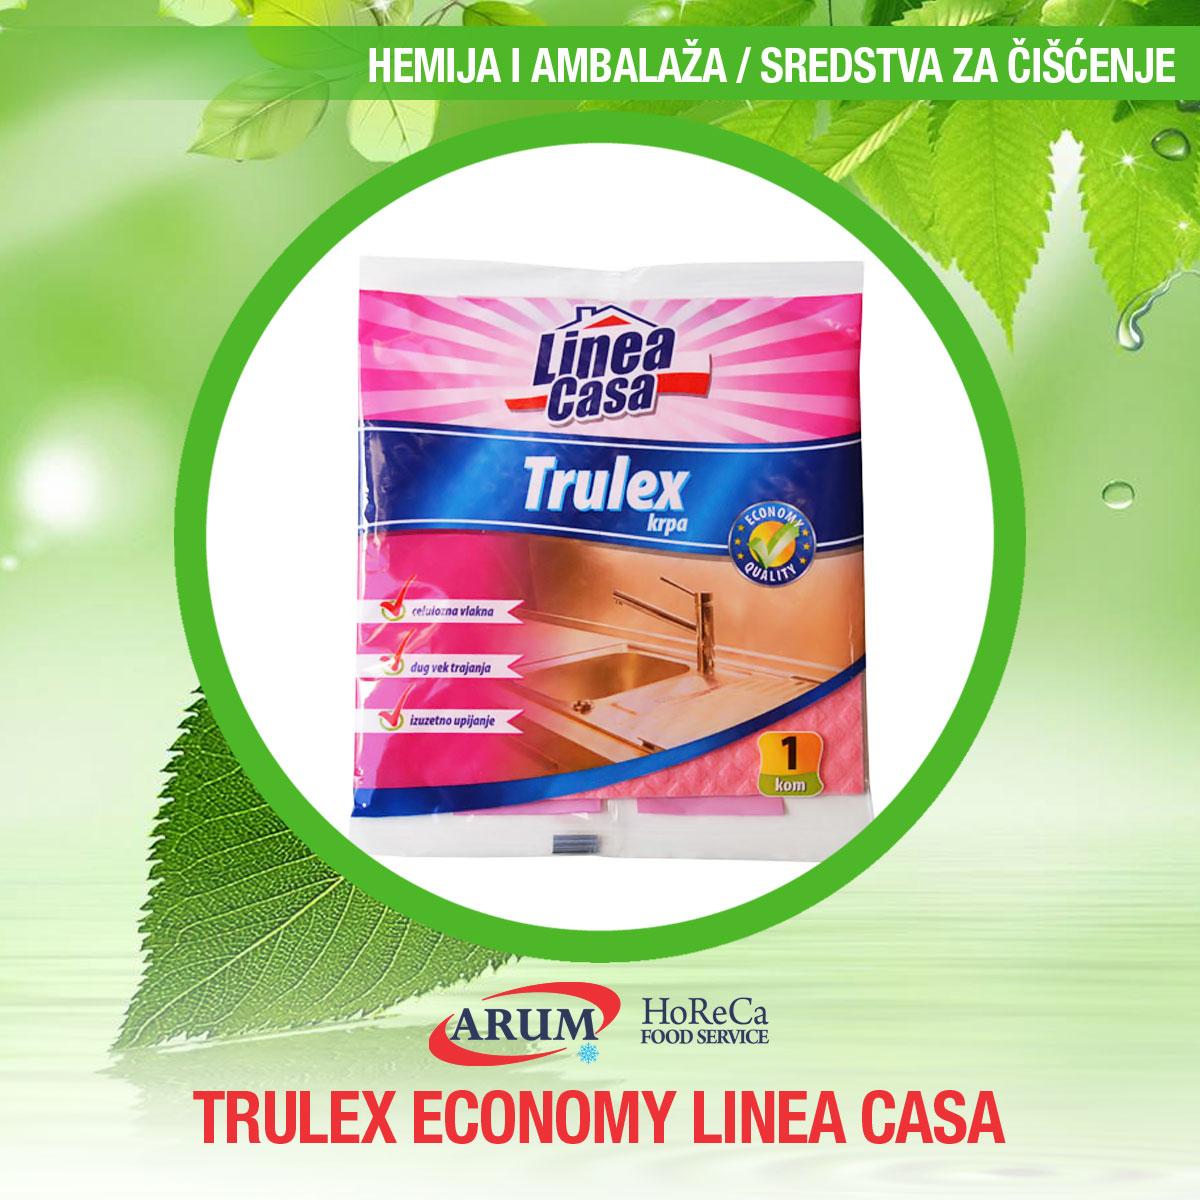 Trulex economy 3/1 linea casa